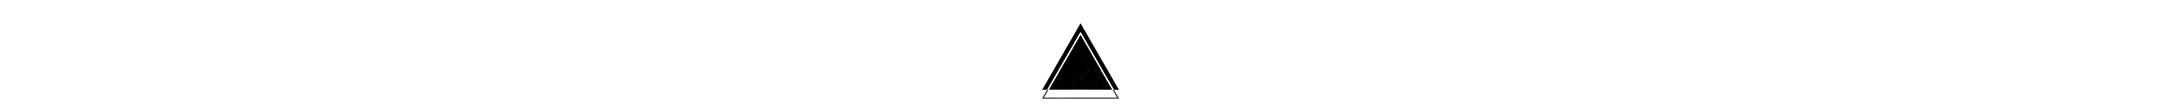 logo-triangle.jpg